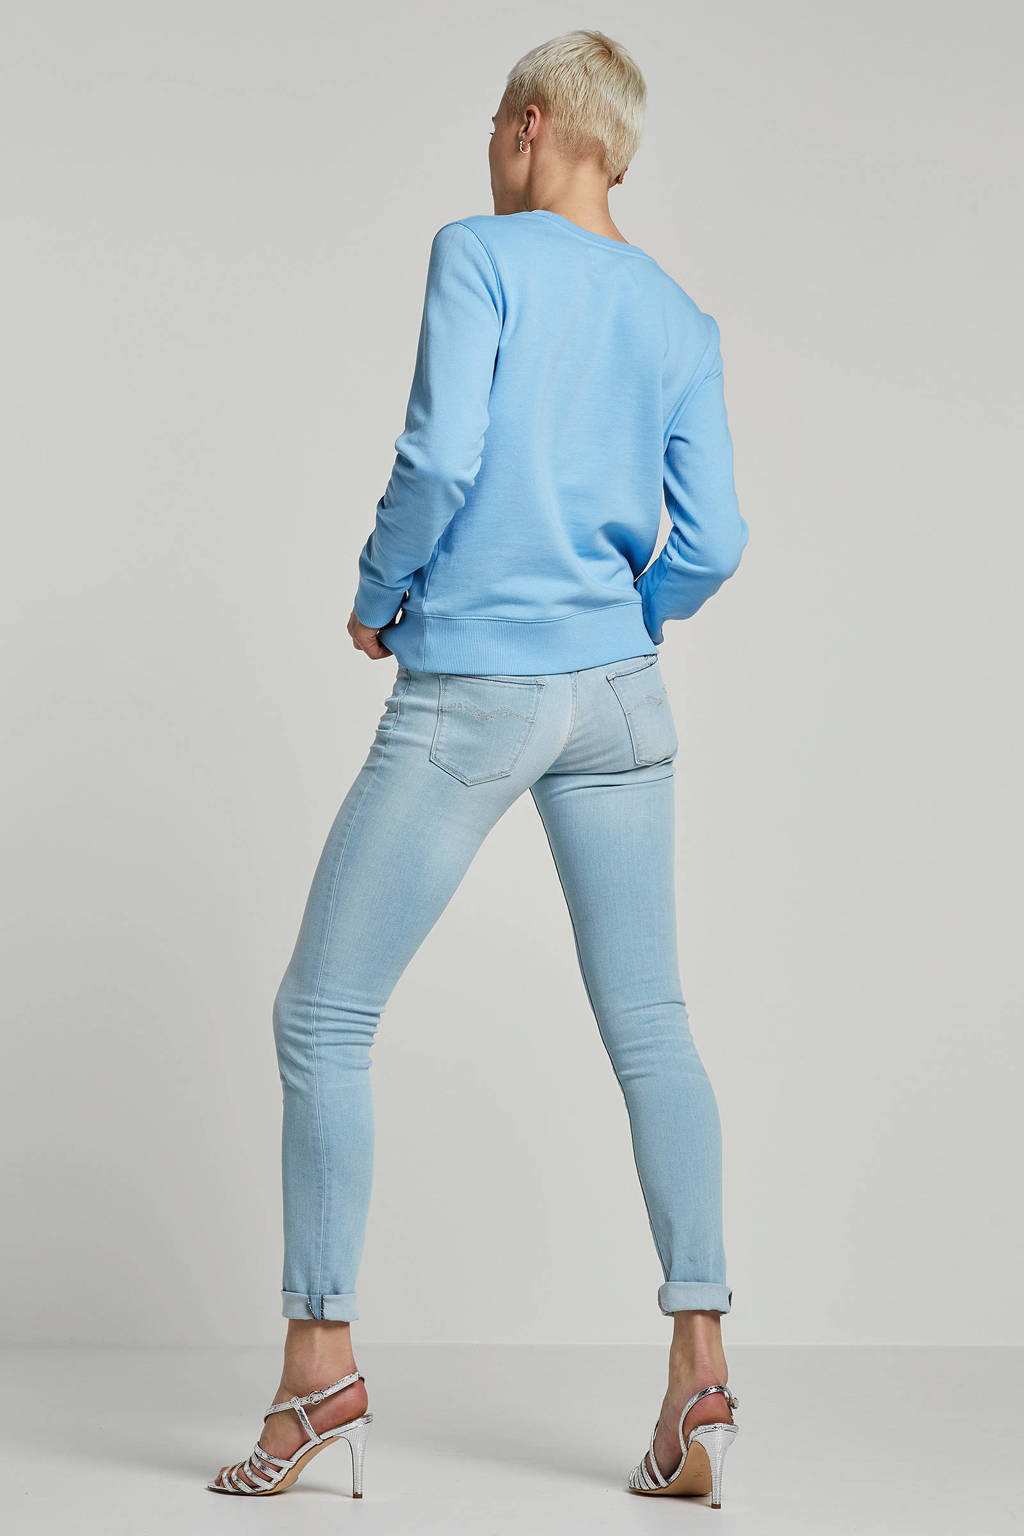 REPLAY Luz jeans, Light denim blue